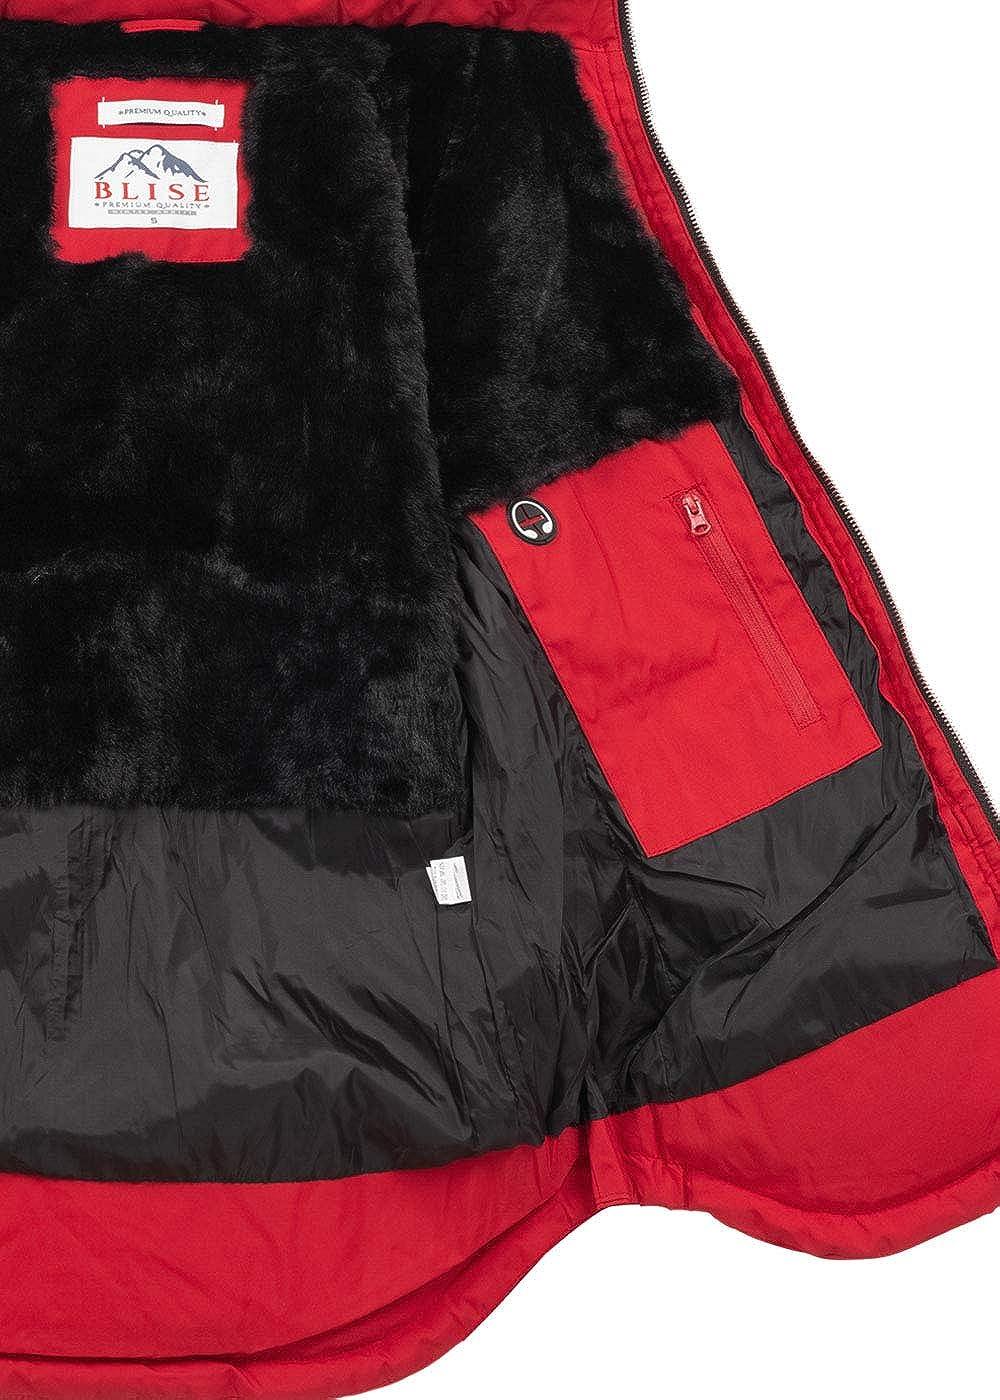 Blise Damen Winterjacke Winterparka Kapuze & Webpelz abnehmbar Teddyfutter schwarz Rot